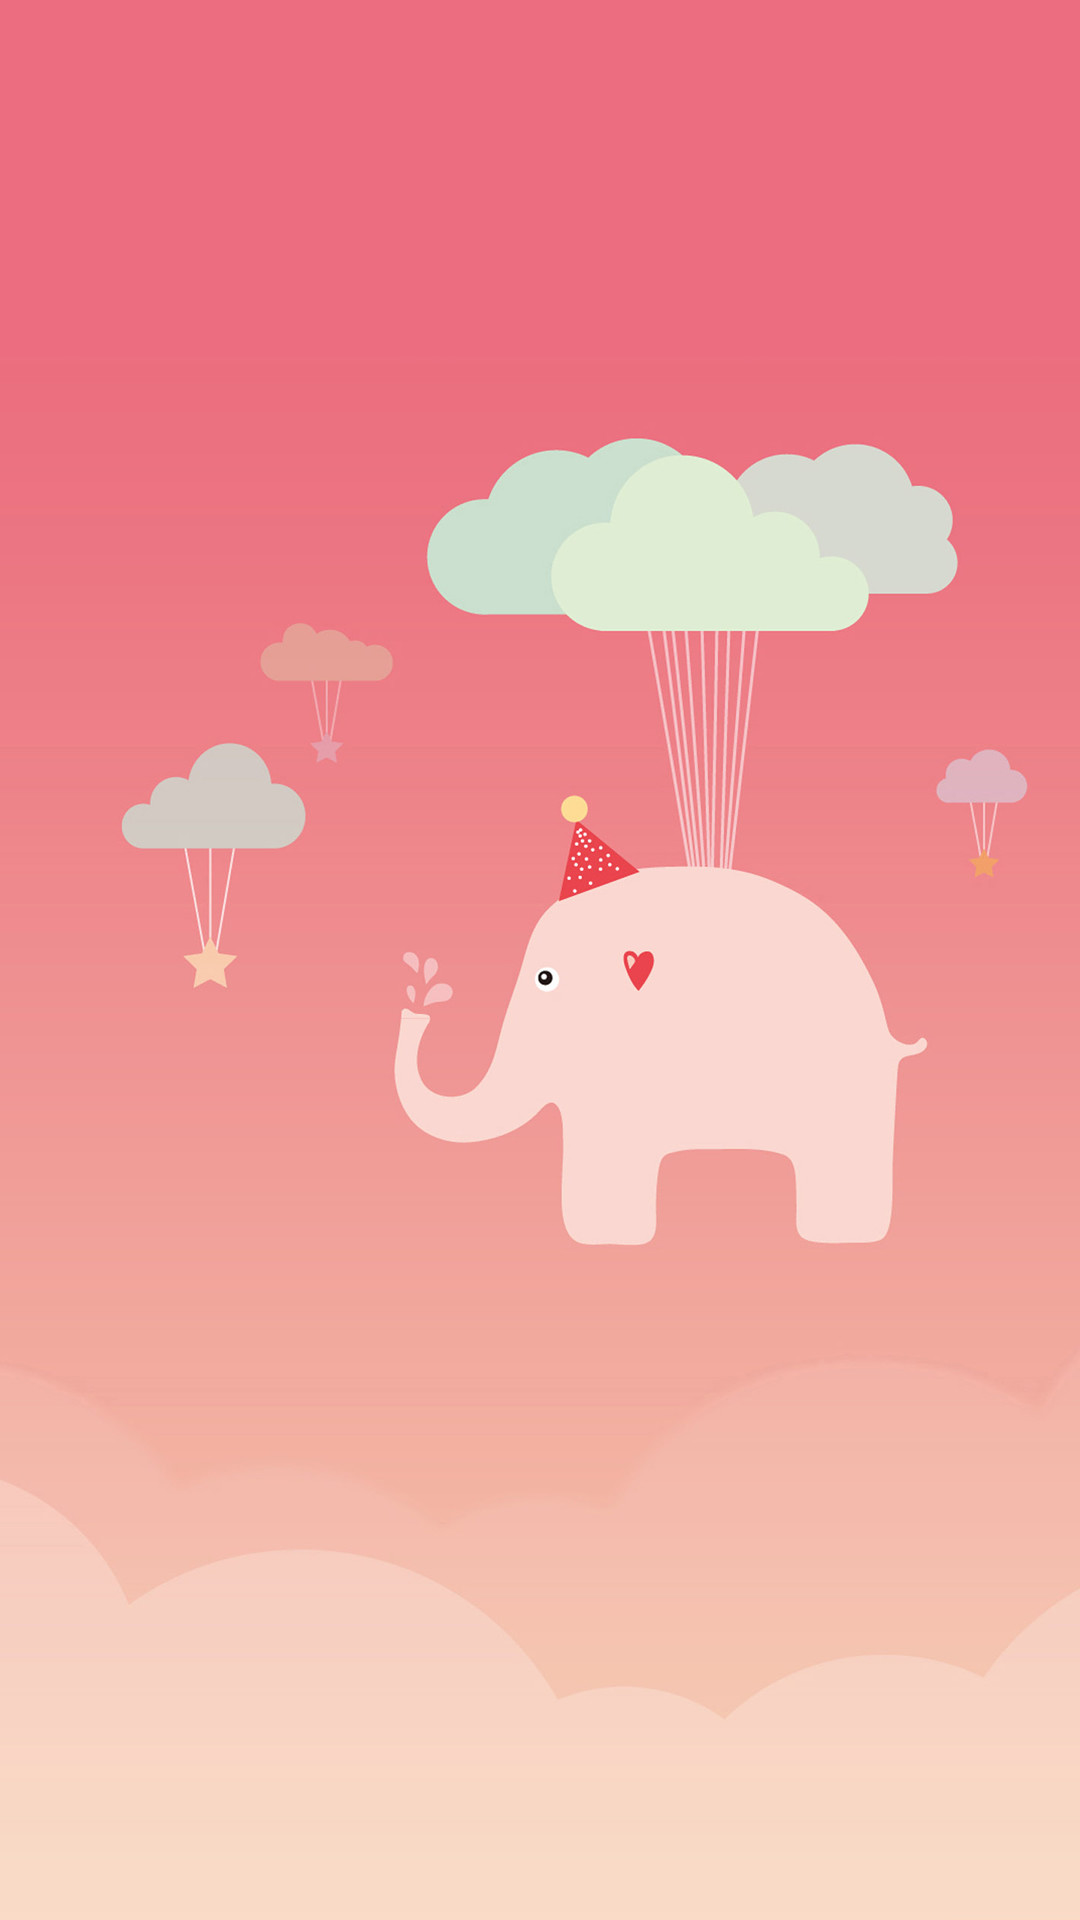 Cute Elephant iPhone 6 Wallpaper Download | iPhone Wallpapers, iPad .